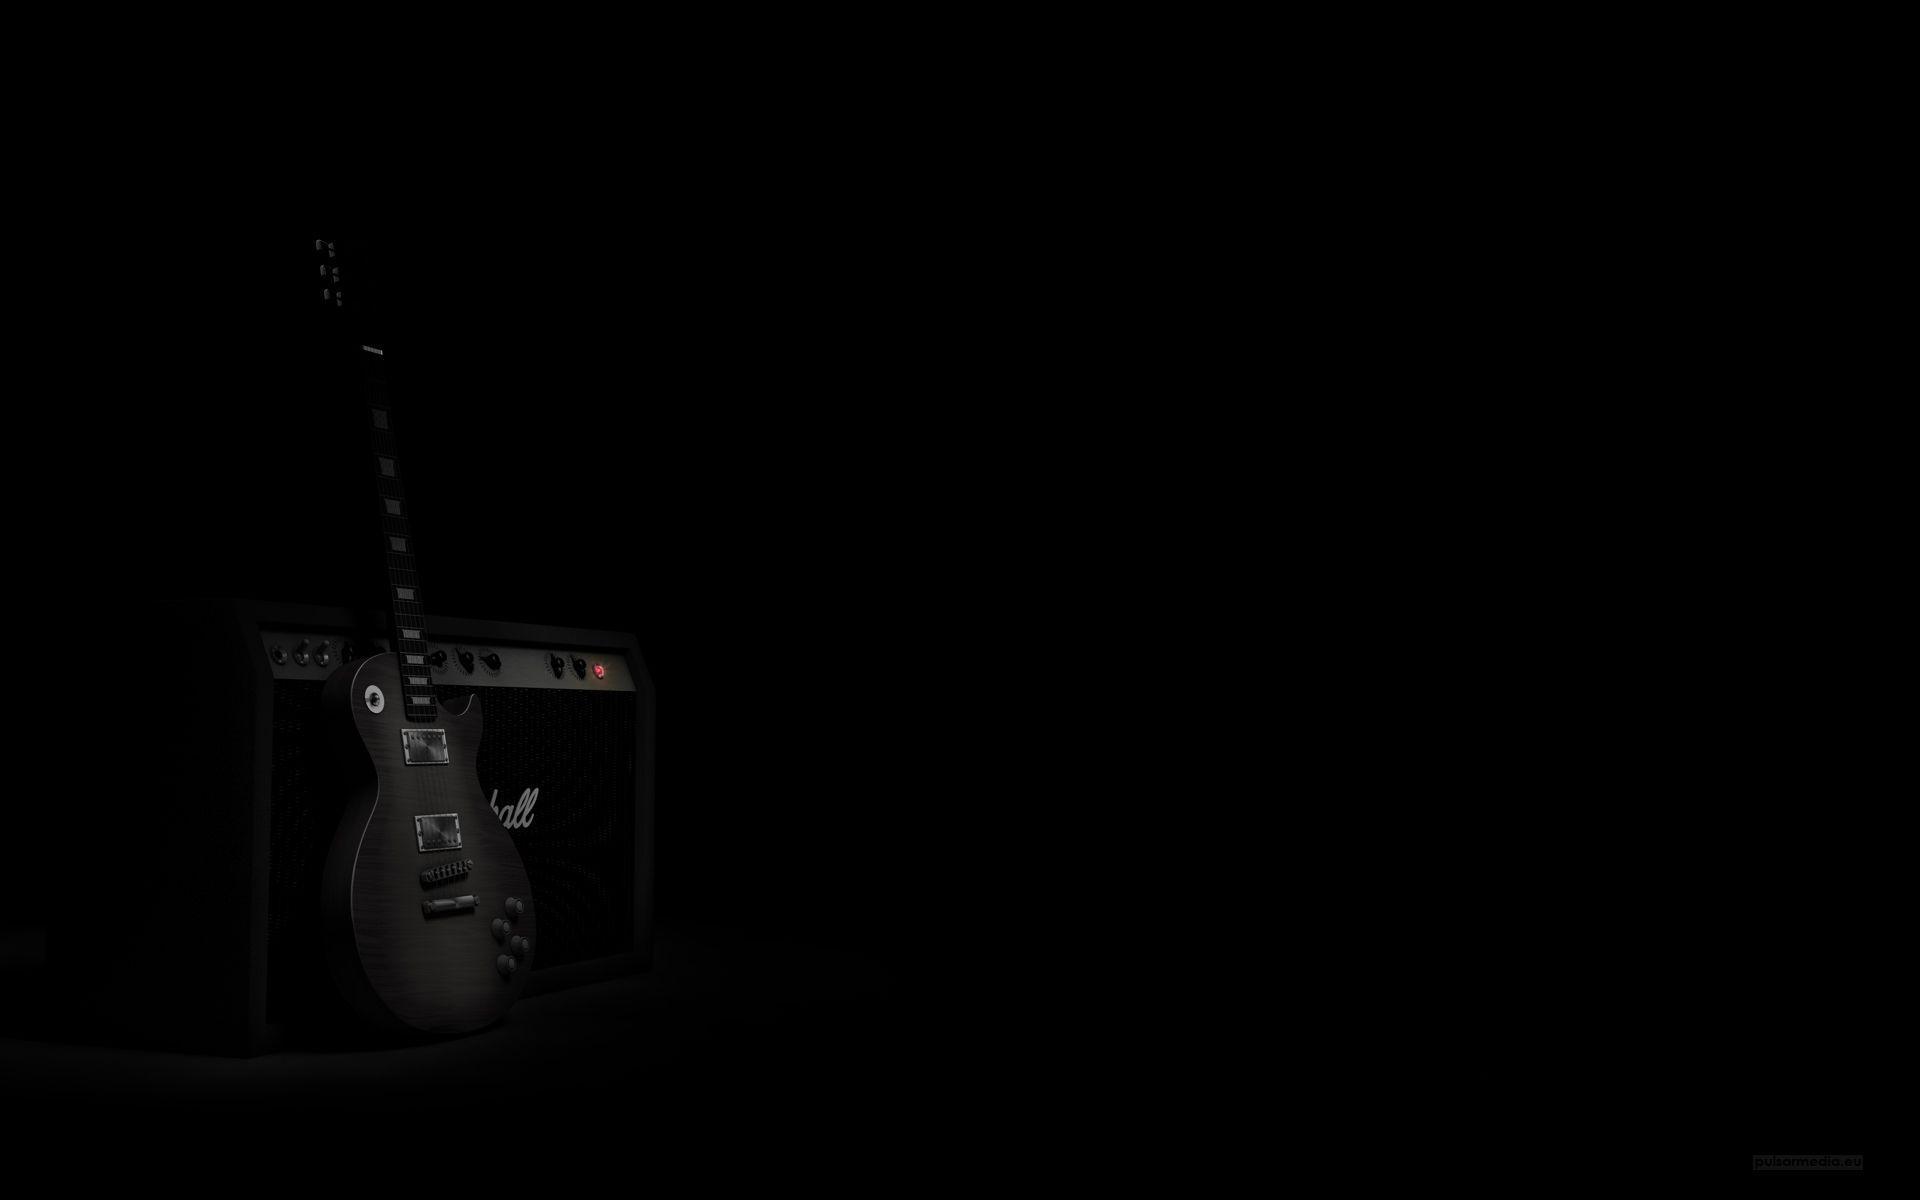 Unduh 9000+ Wallpaper Black Music HD Paling Baru